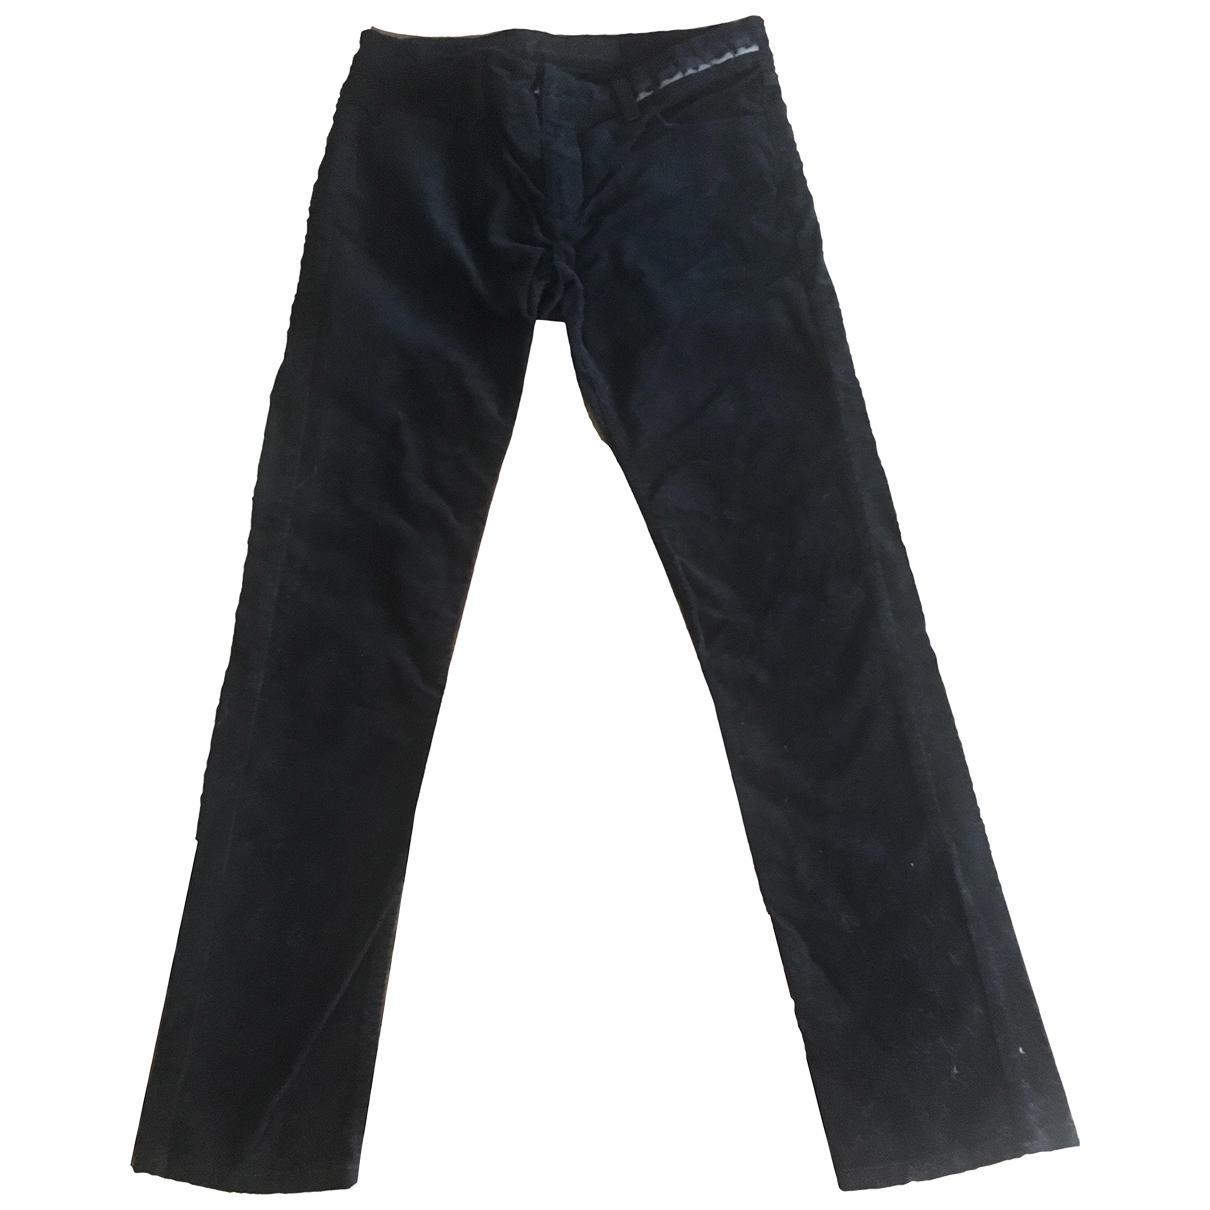 Zadig & Voltaire \N Black Cotton Jeans for Women 36 FR